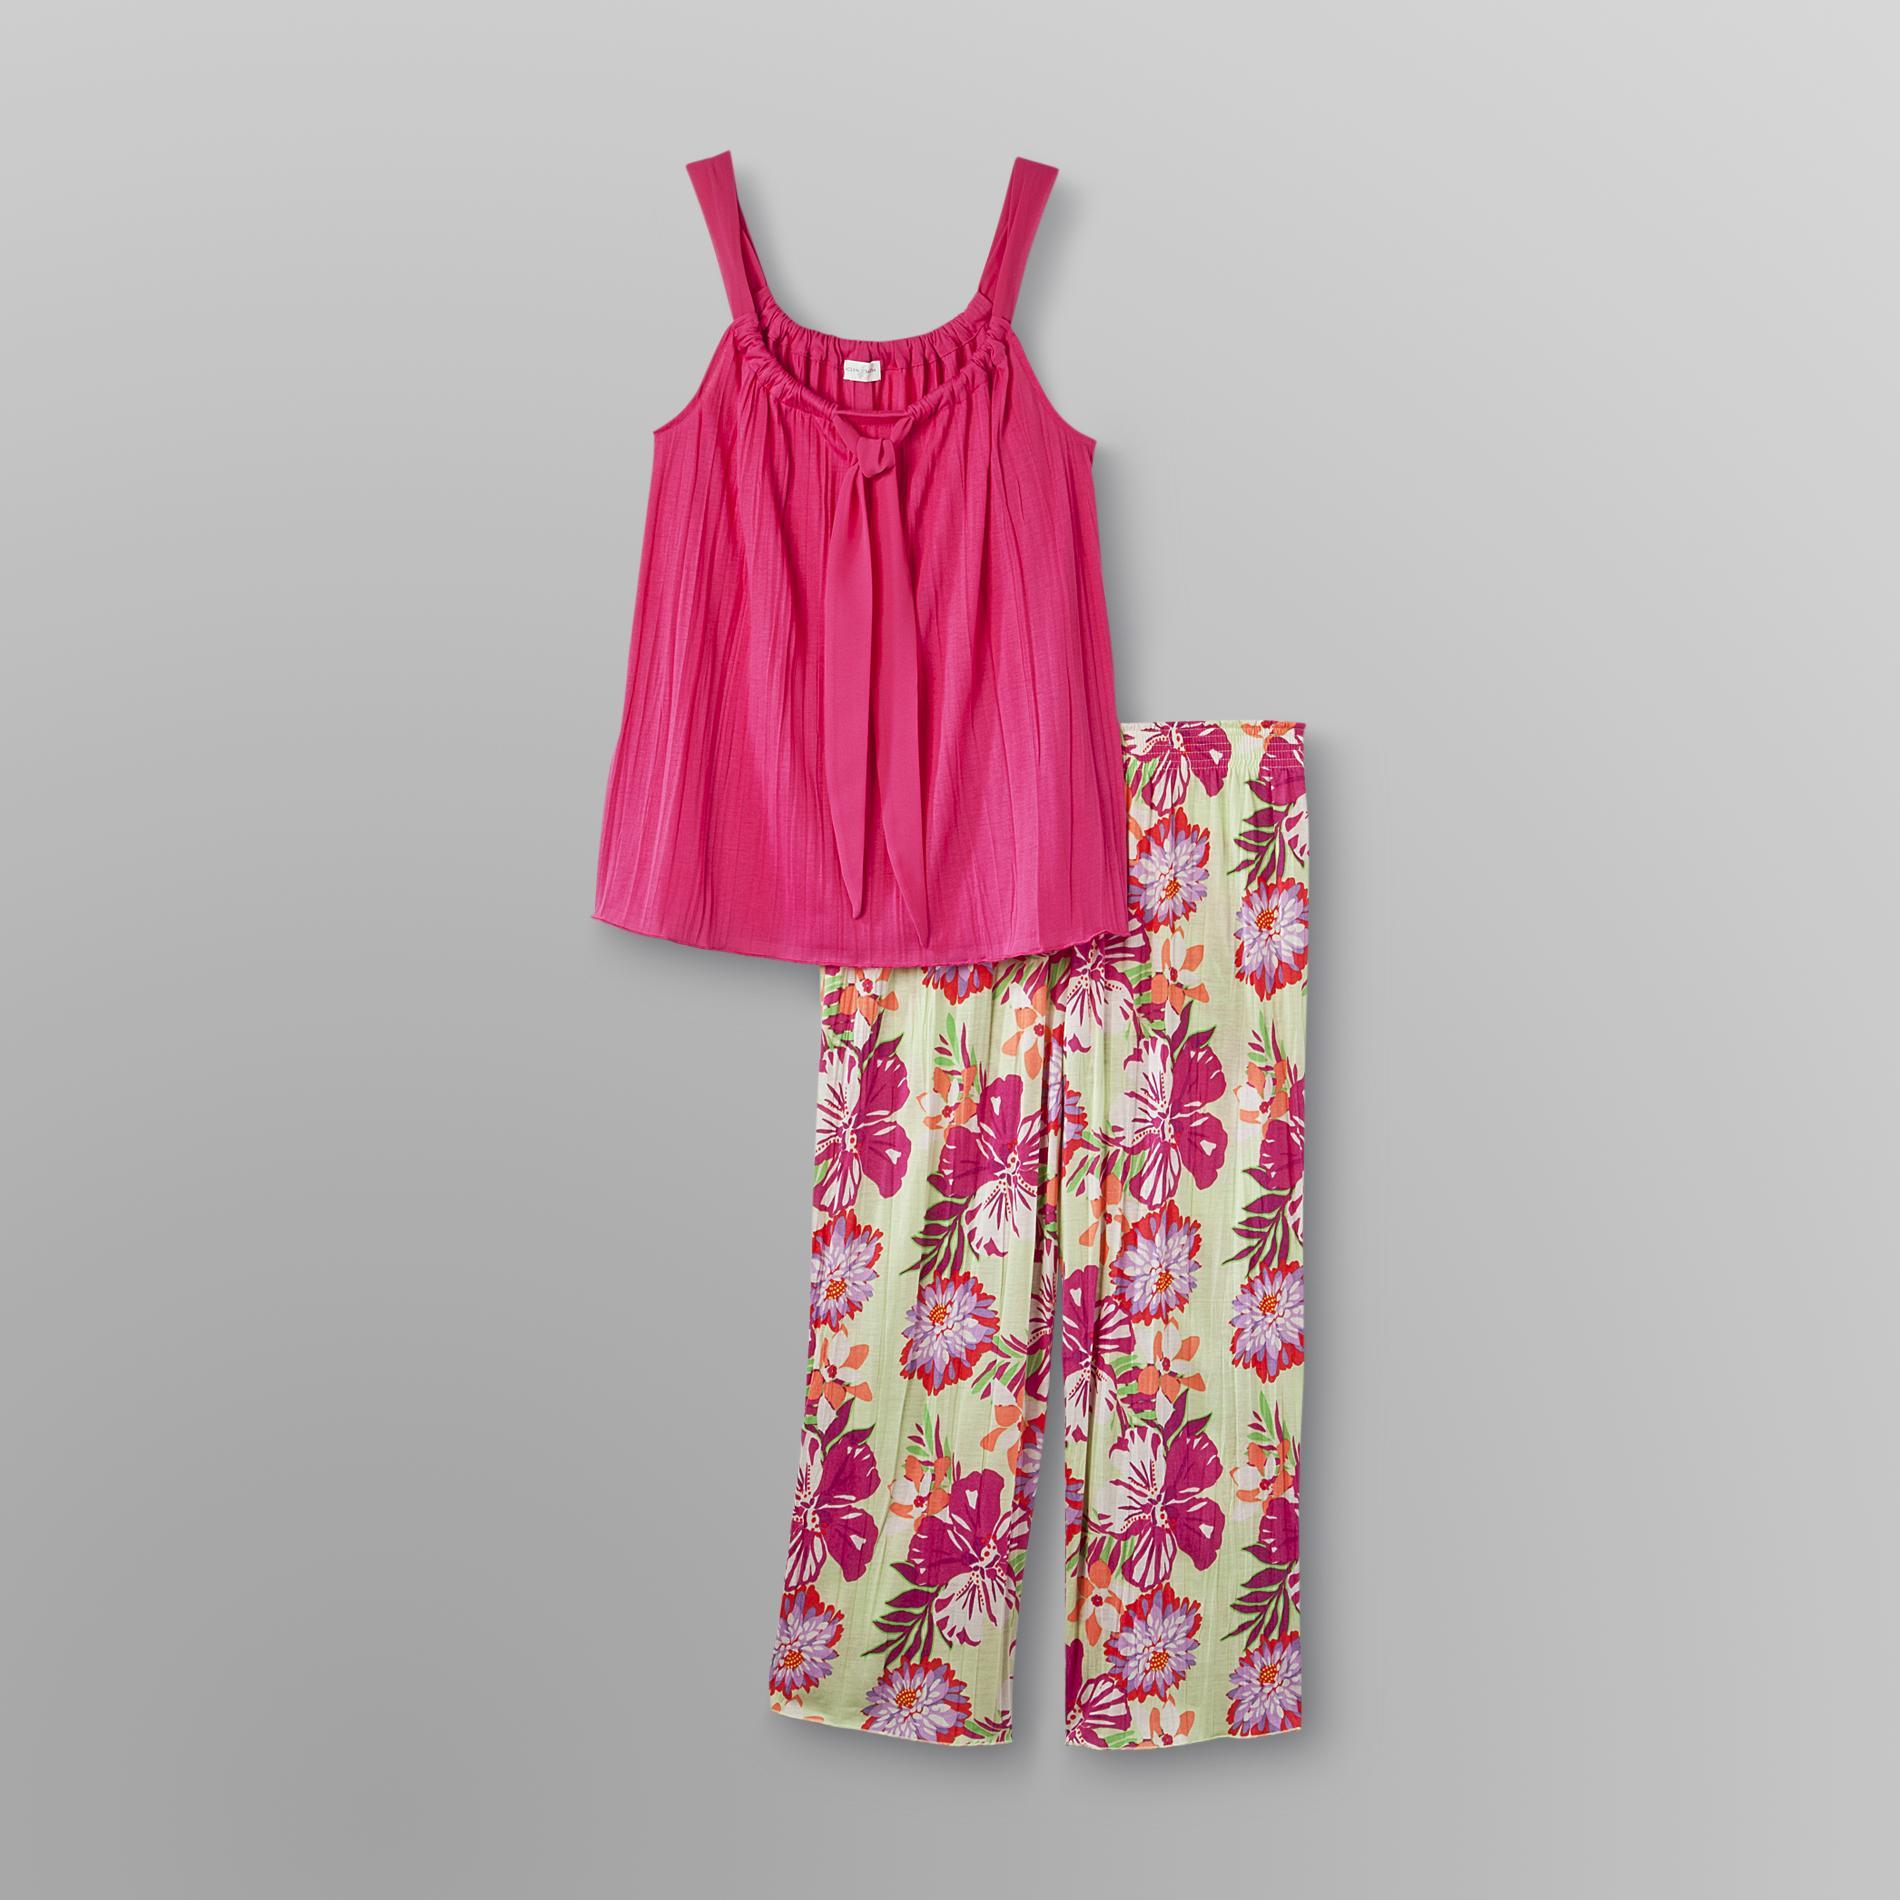 Jaclyn Smith Women' Capri Pajamas - Floral